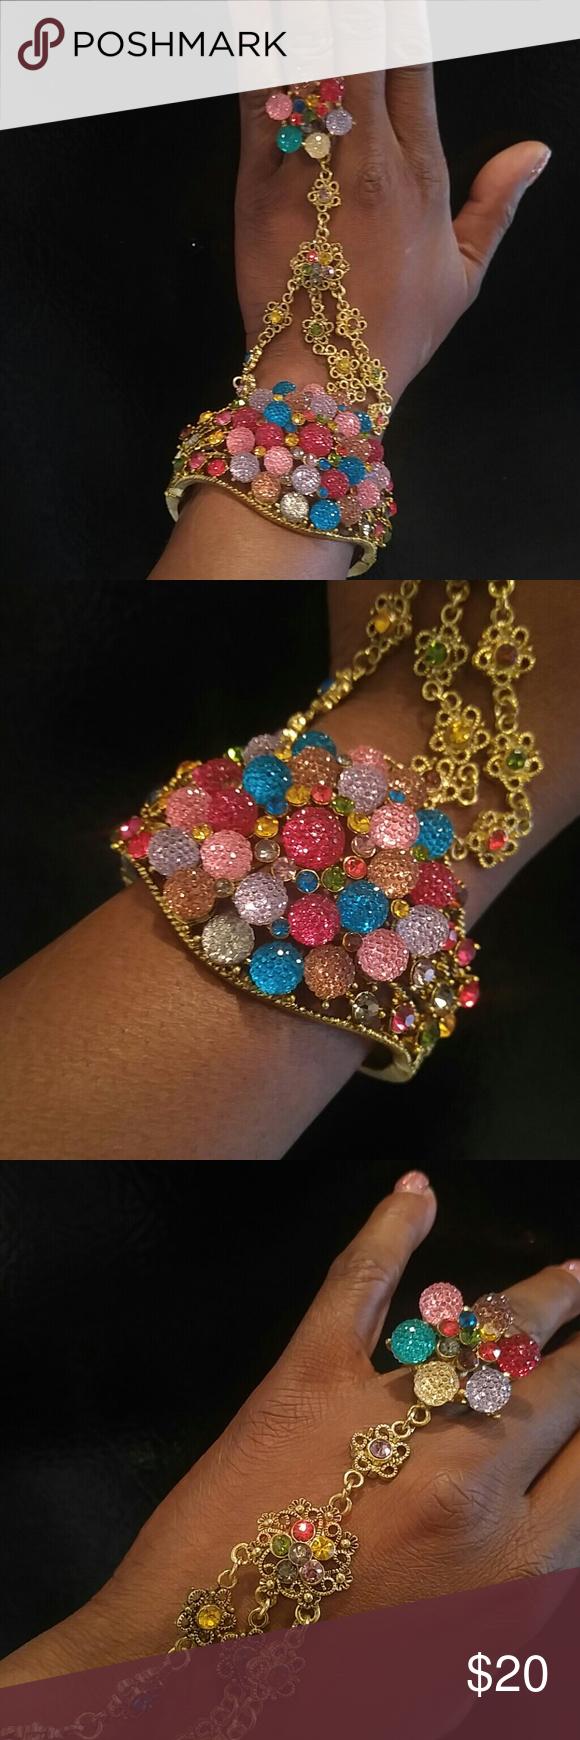 Sparkling Gumball Slave Ring Bracelet Sparkling Rhinestone Gumball Slave Ring Bracelet Beautiful Colors Gold Tone Metal Hinge Open Bracelet Adjustable Ring Stunning Condition and Sparkle ! Jewelry Bracelets